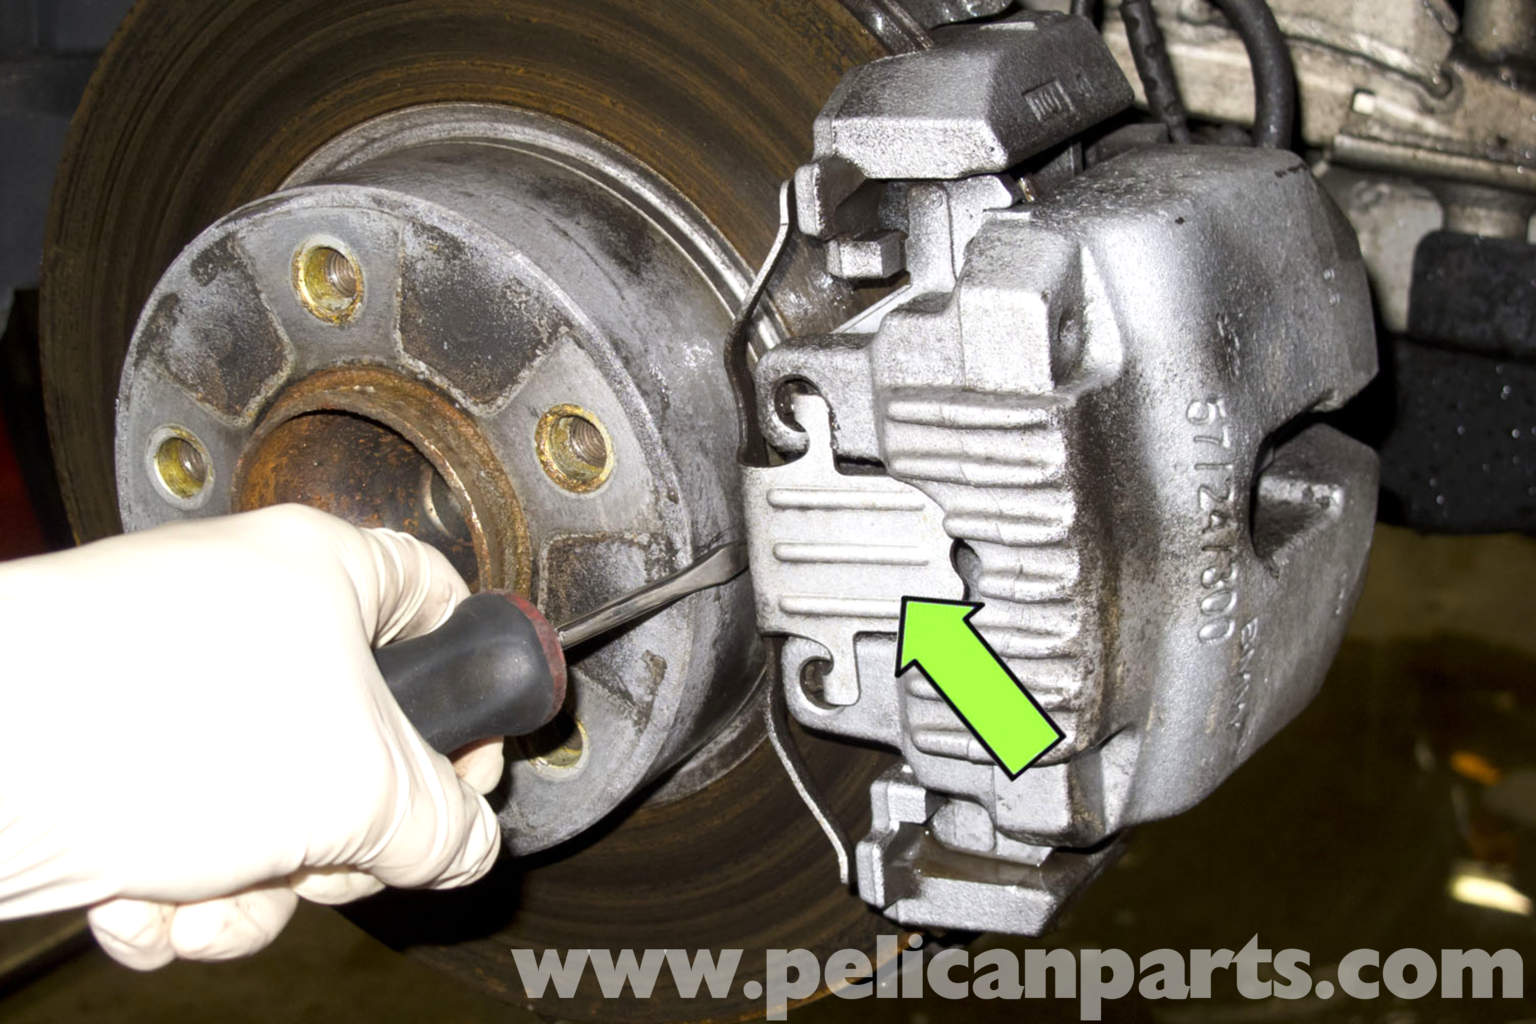 bmw x3 headlight wiring diagram    bmw    e90 brake caliper replacement e91  e92  e93     bmw    e90 brake caliper replacement e91  e92  e93